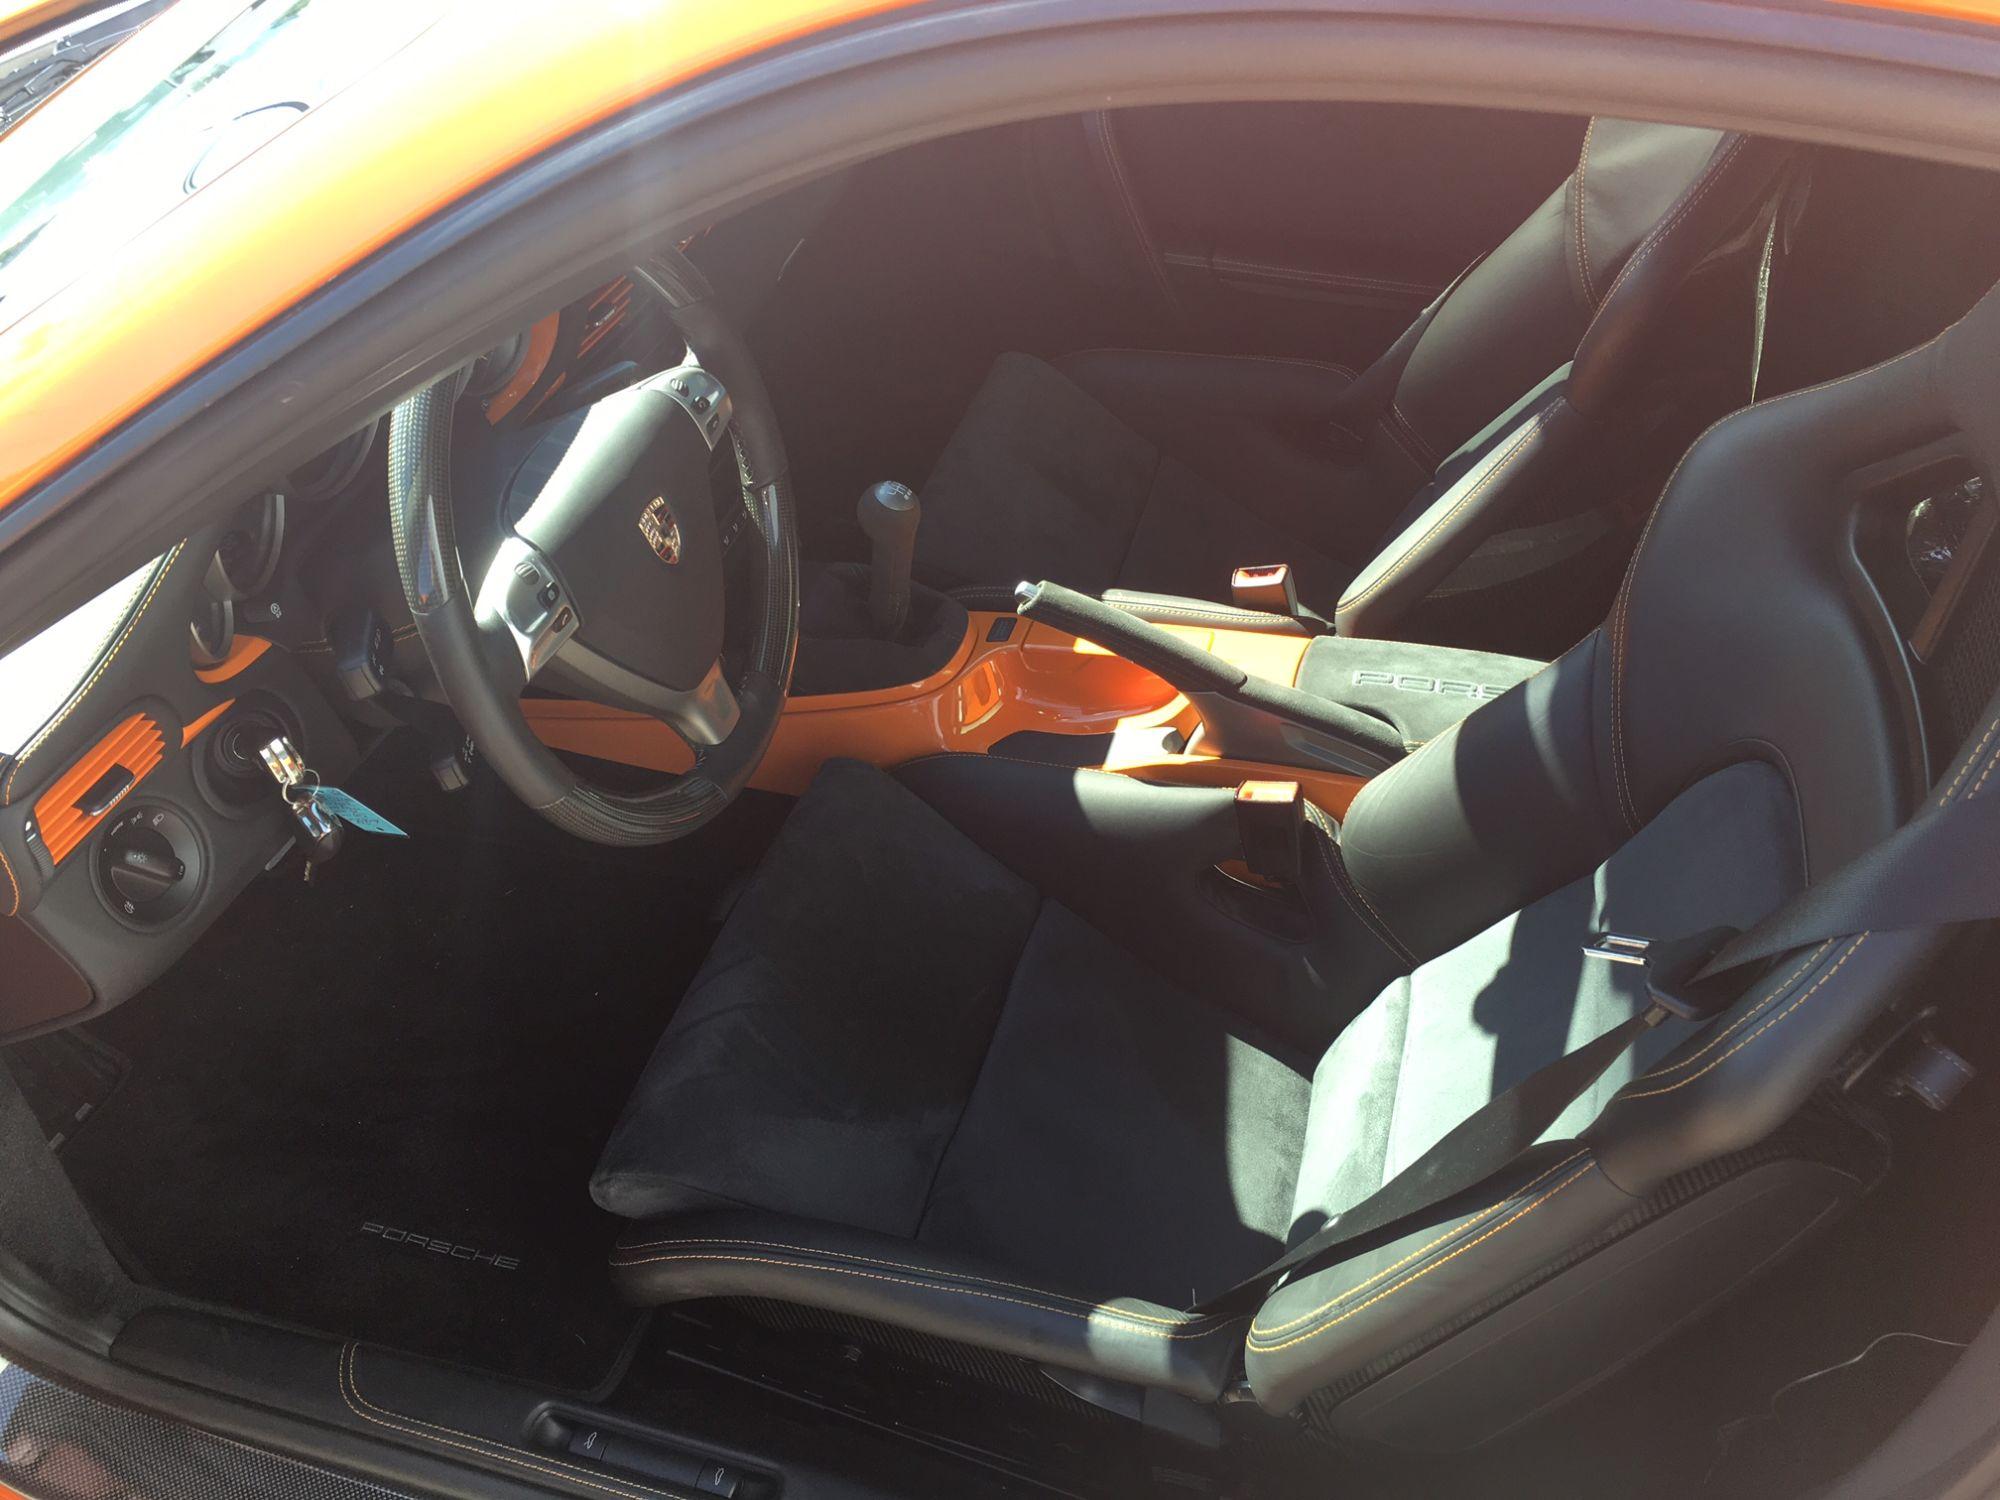 2009-porsche-911-gt2-in-pts-orange-for-sale-at-410000_27 Wonderful Porsche 911 Gt2 Wheel for Sale Cars Trend